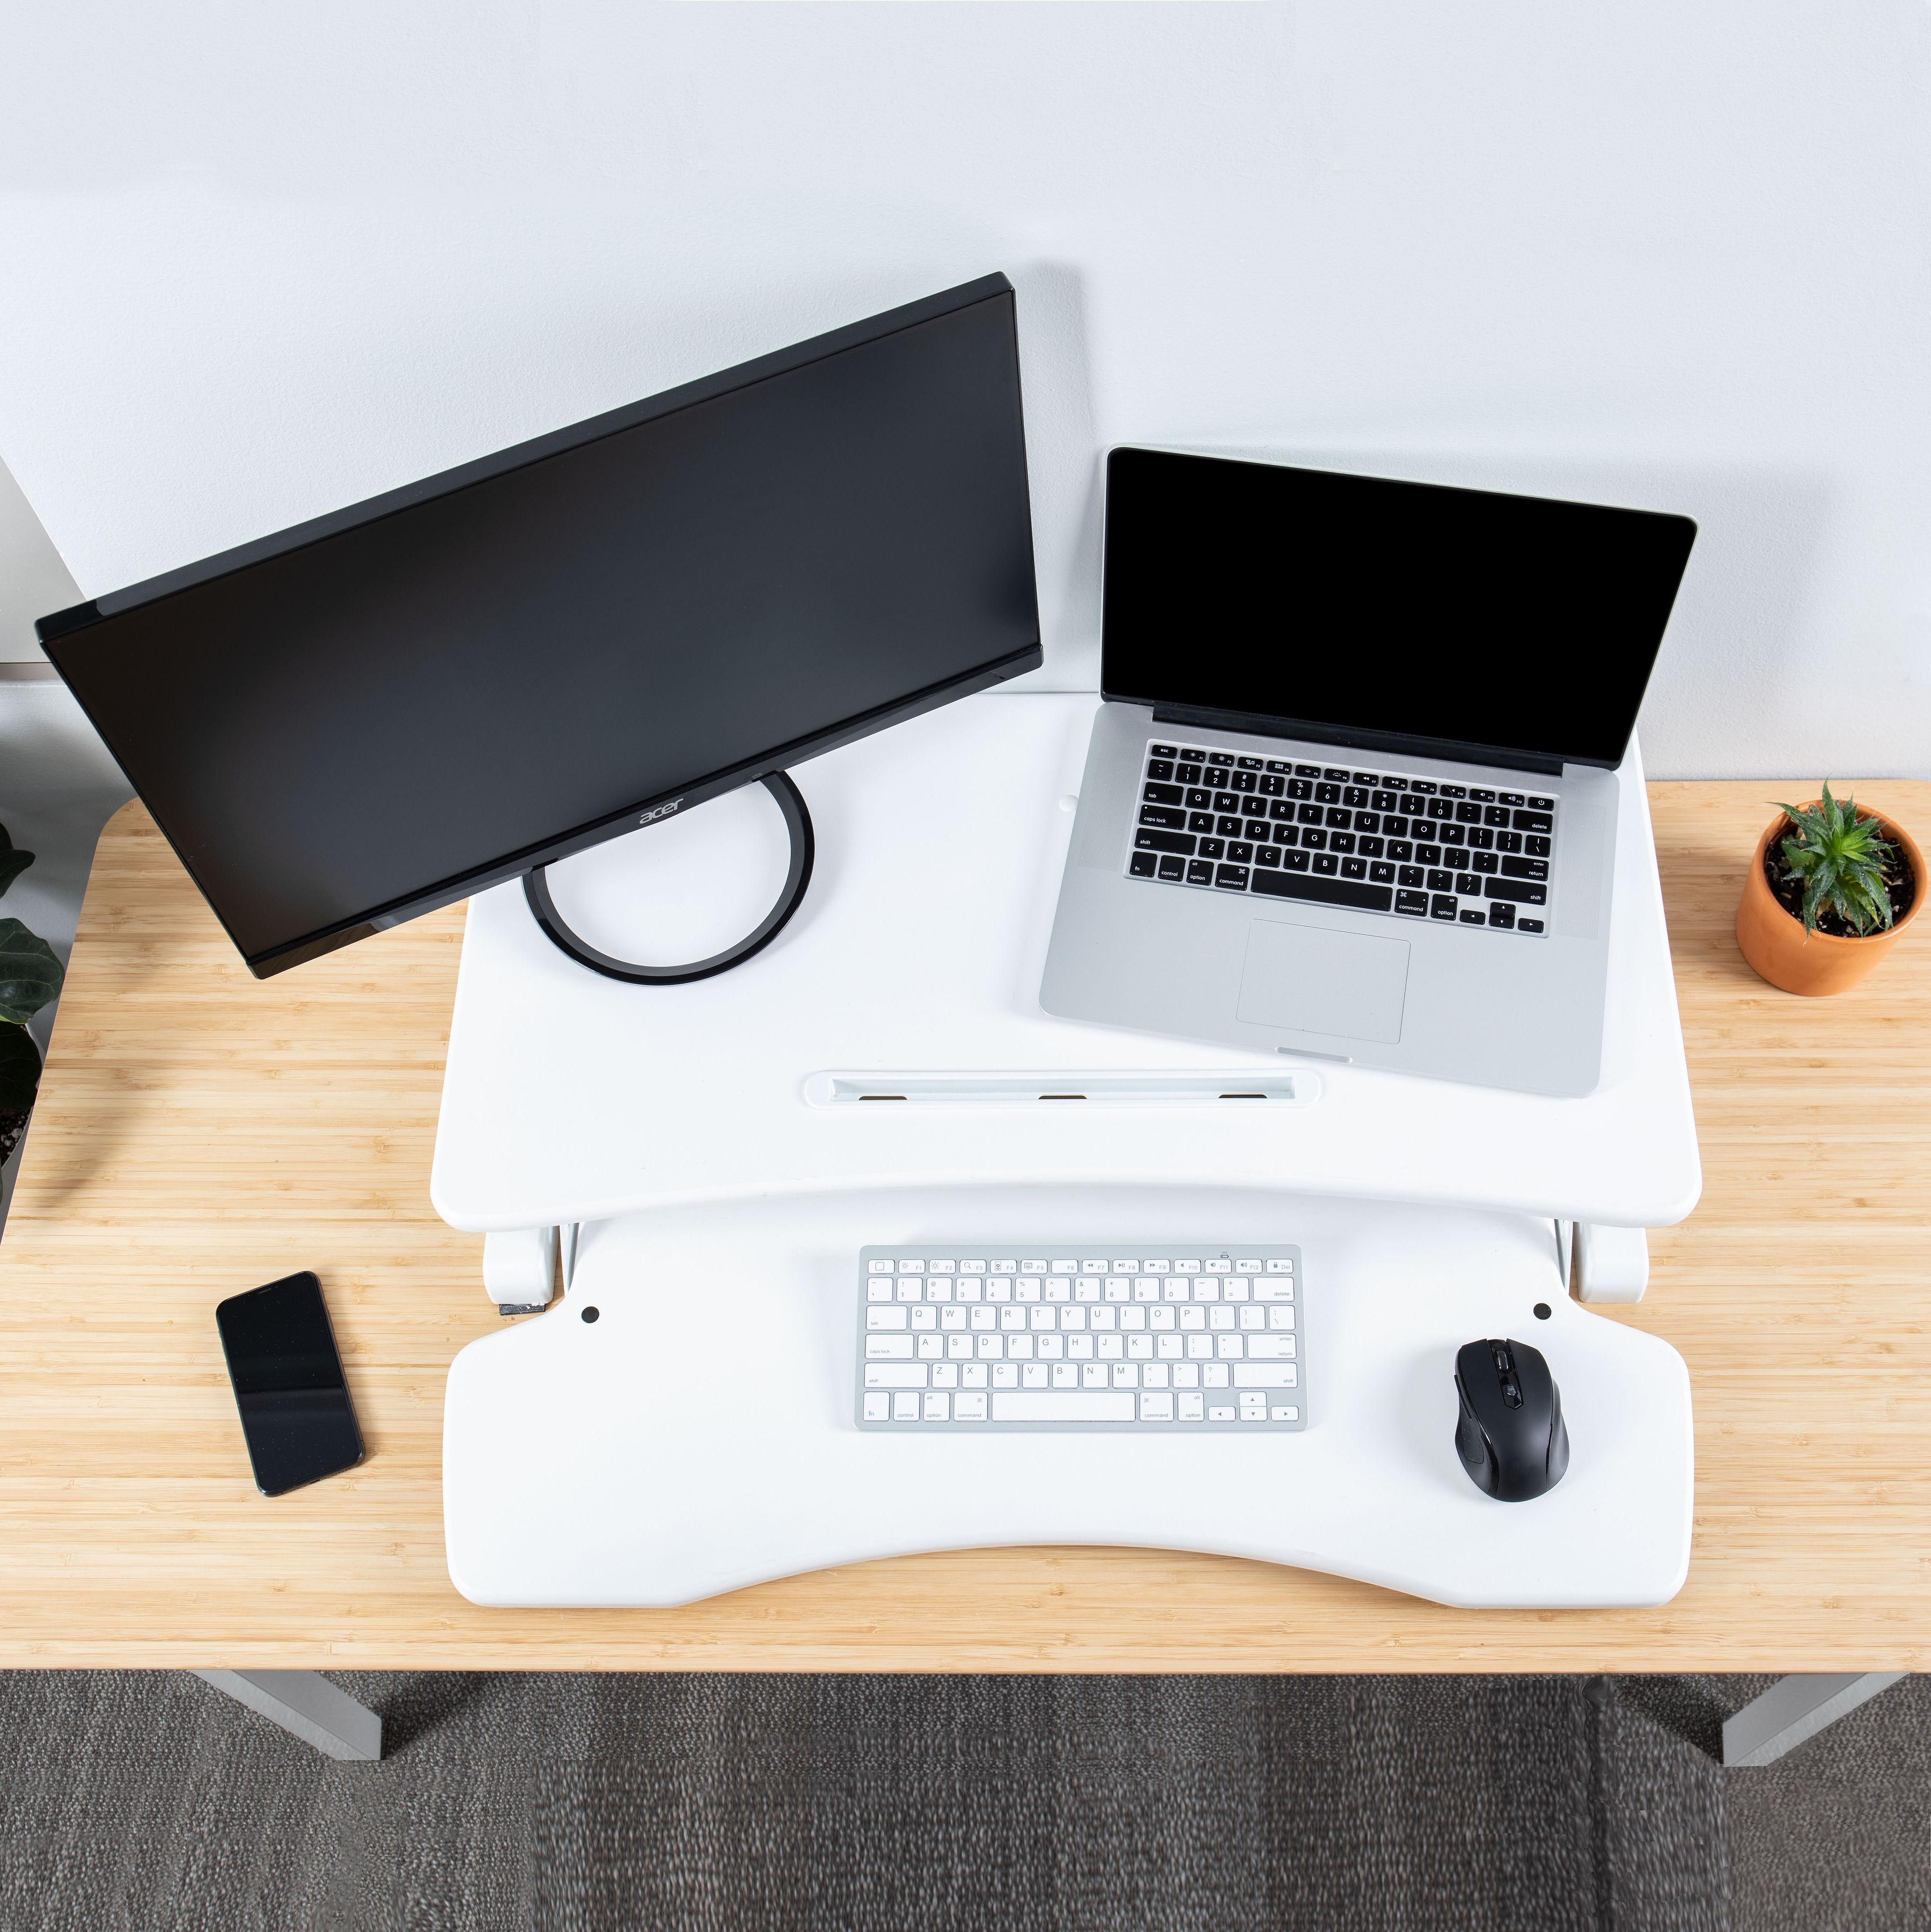 Rise-X-Light-Standing-Desk-Stand-Up-Desk-Height-Adjustable-Desk-Converter thumbnail 17